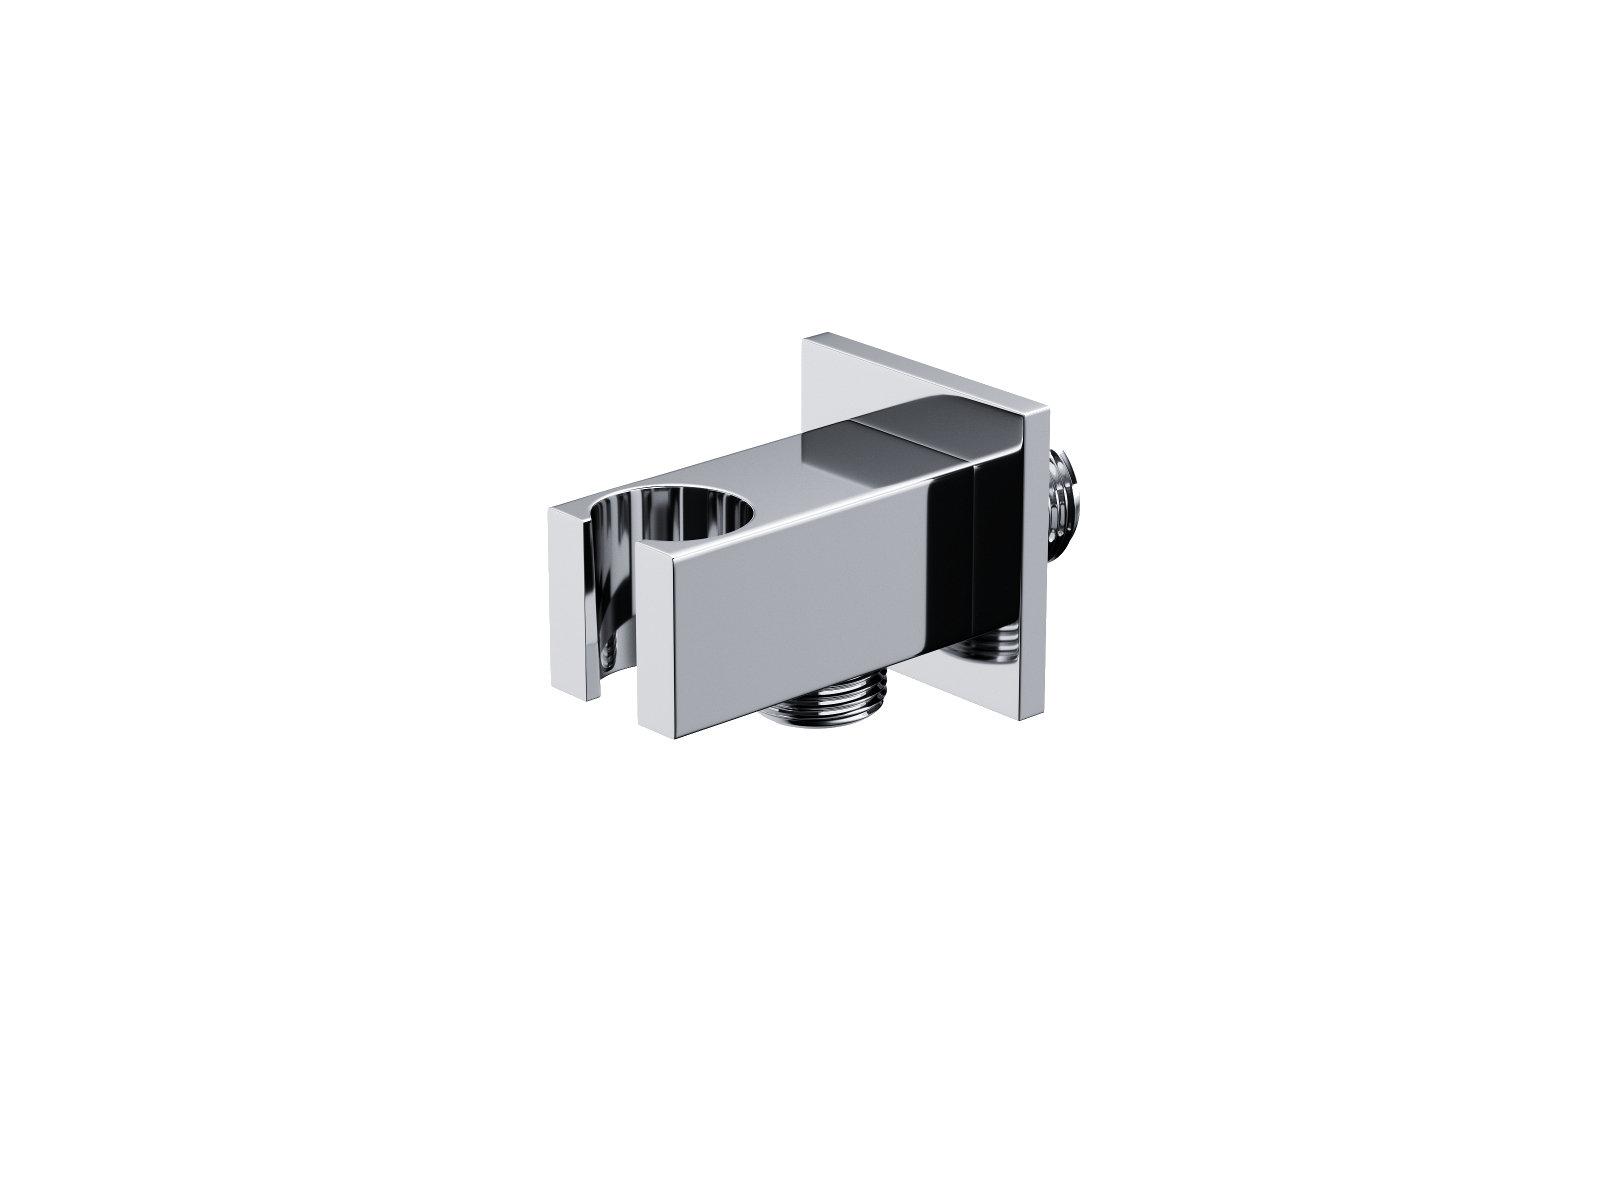 Sprchová podpera Corsan CMU041 s pripojením na ručnú sprchu